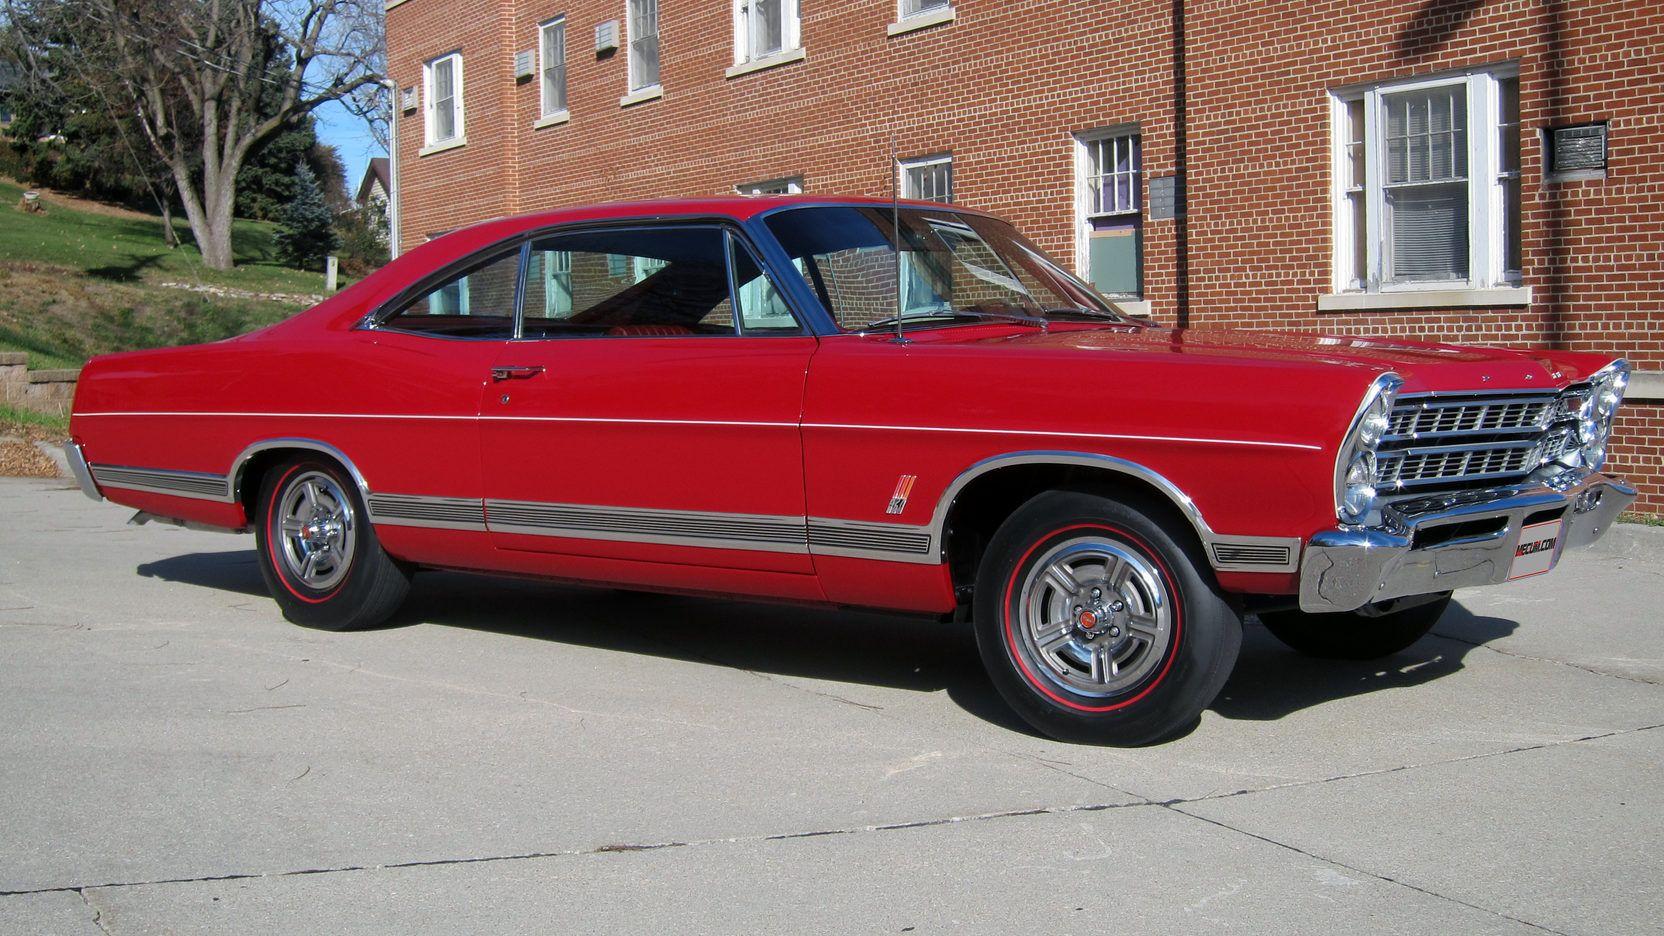 1967 Ford Galaxie XL/7 liter, 427 2x4v V8/T10 4speed/3 50 9